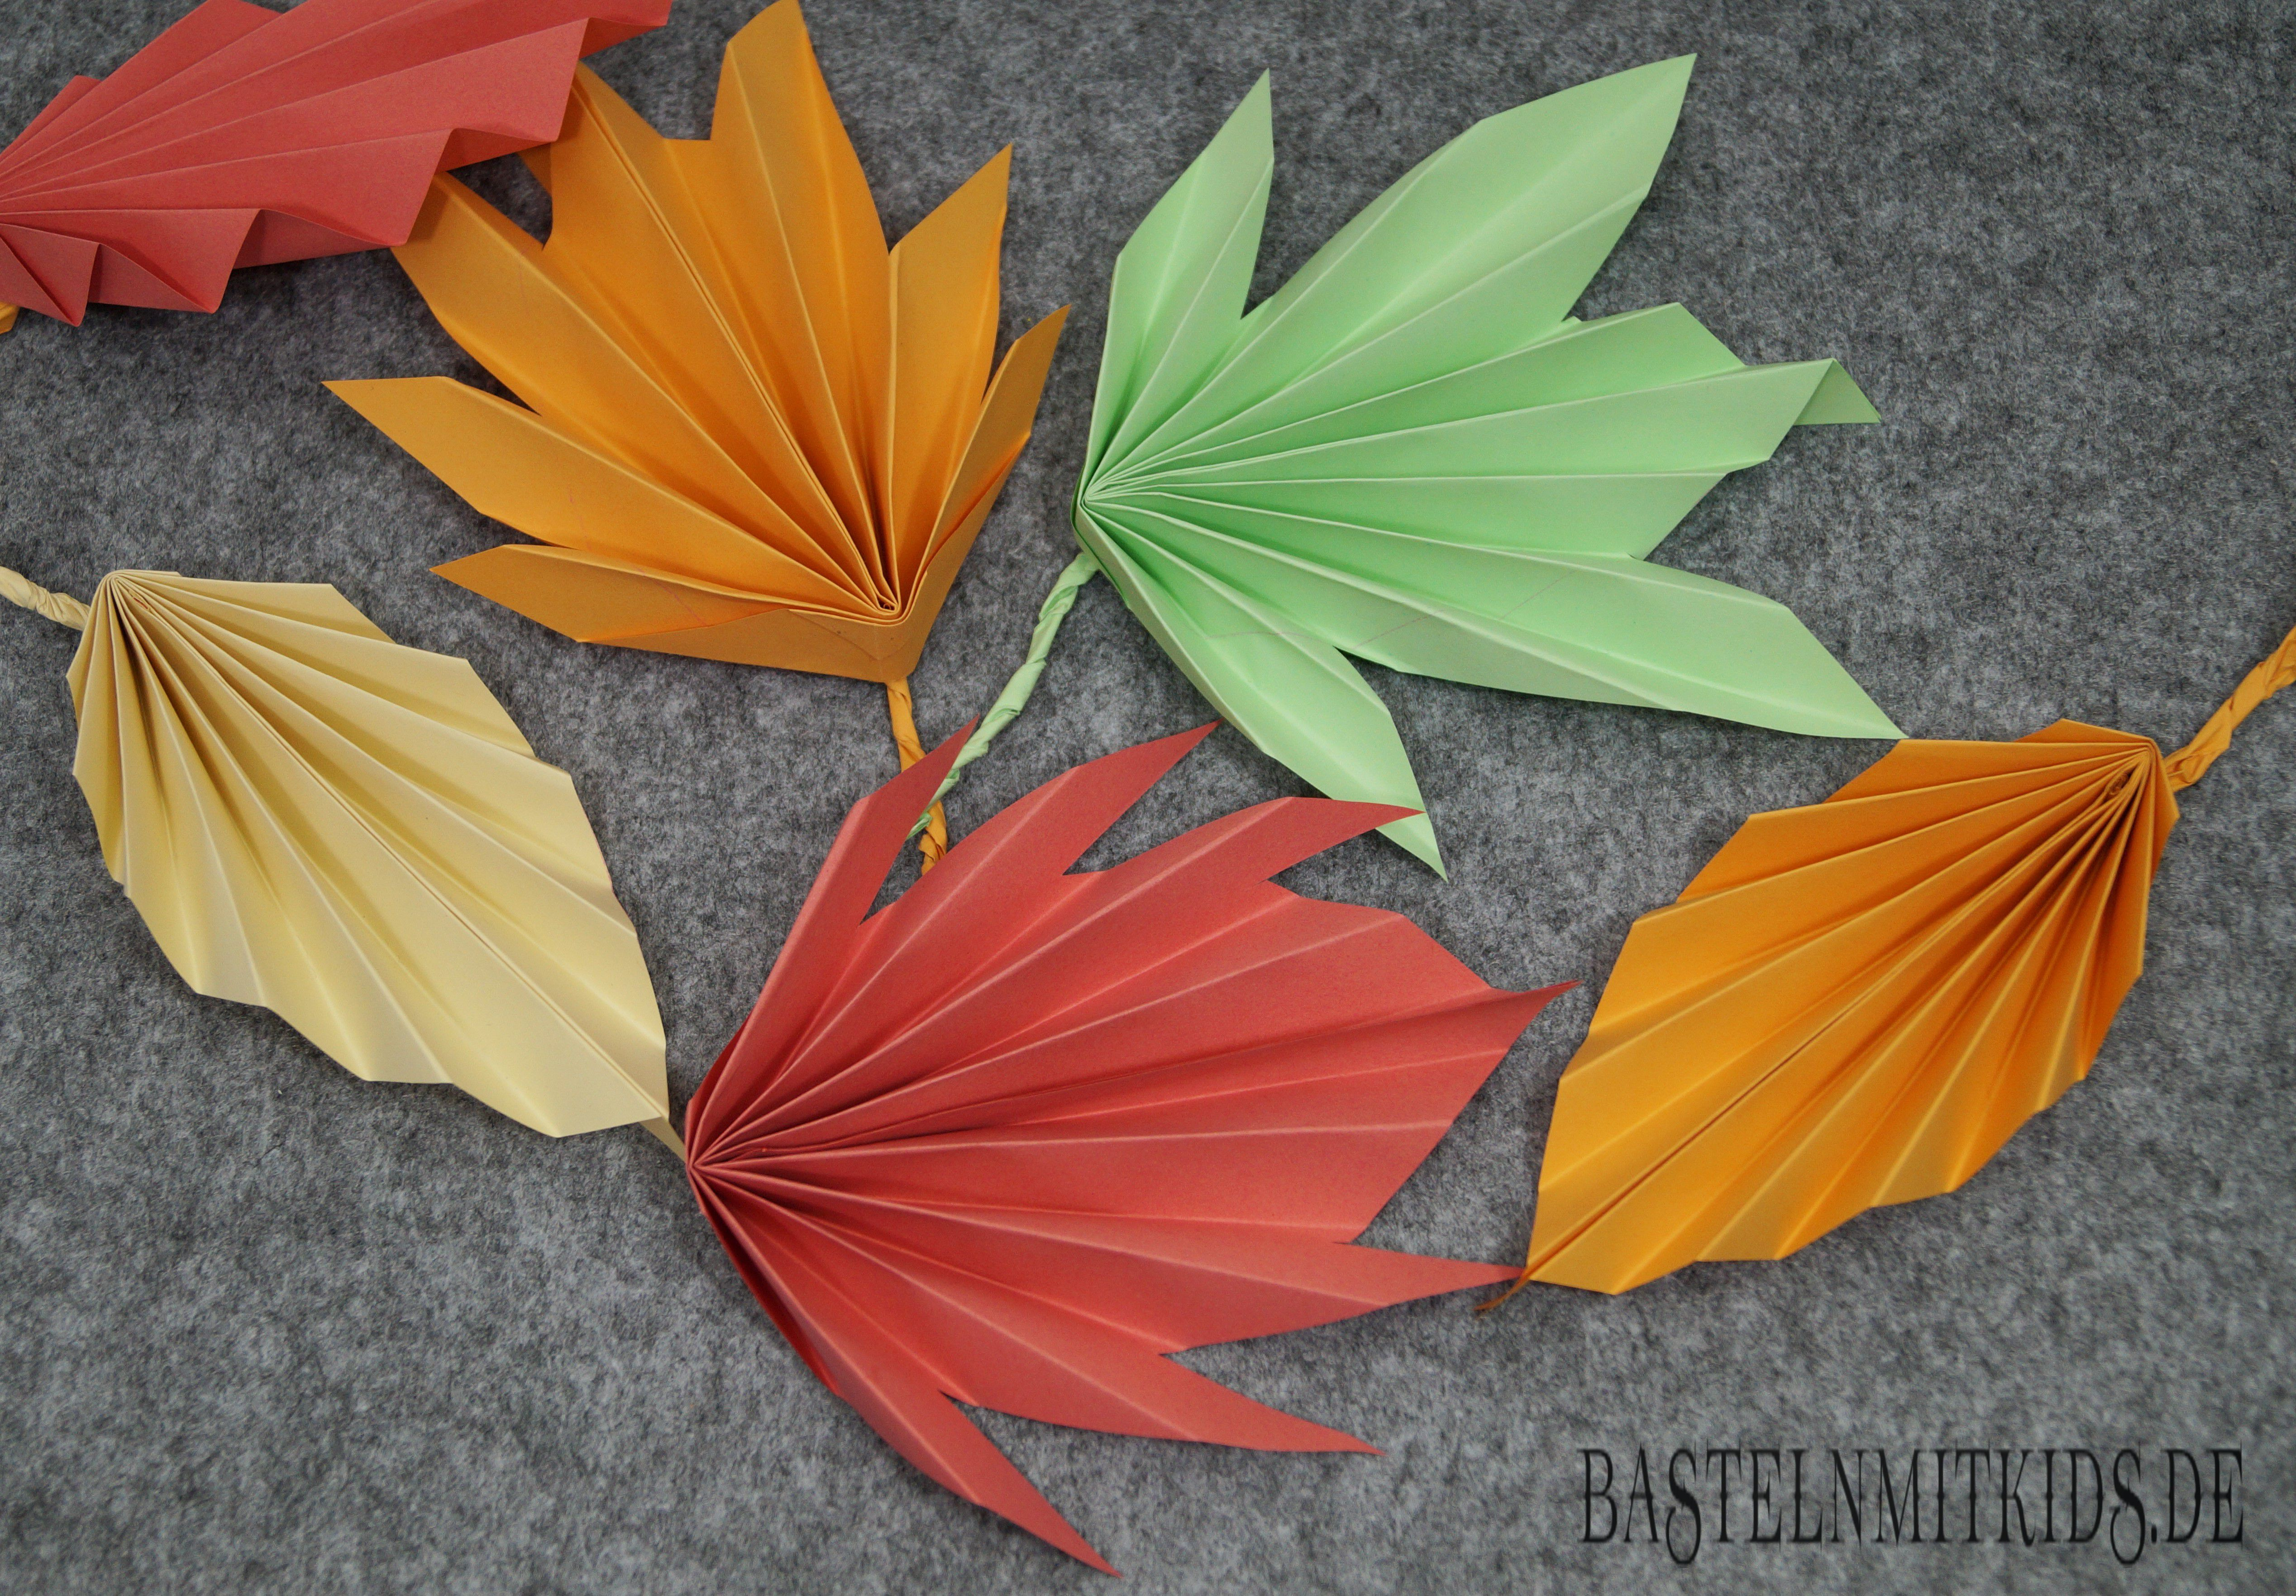 Papier falten f r bunte herbstbl tter basteln mit kindern basteln mit papier basteln - Herbstideen kindergarten ...